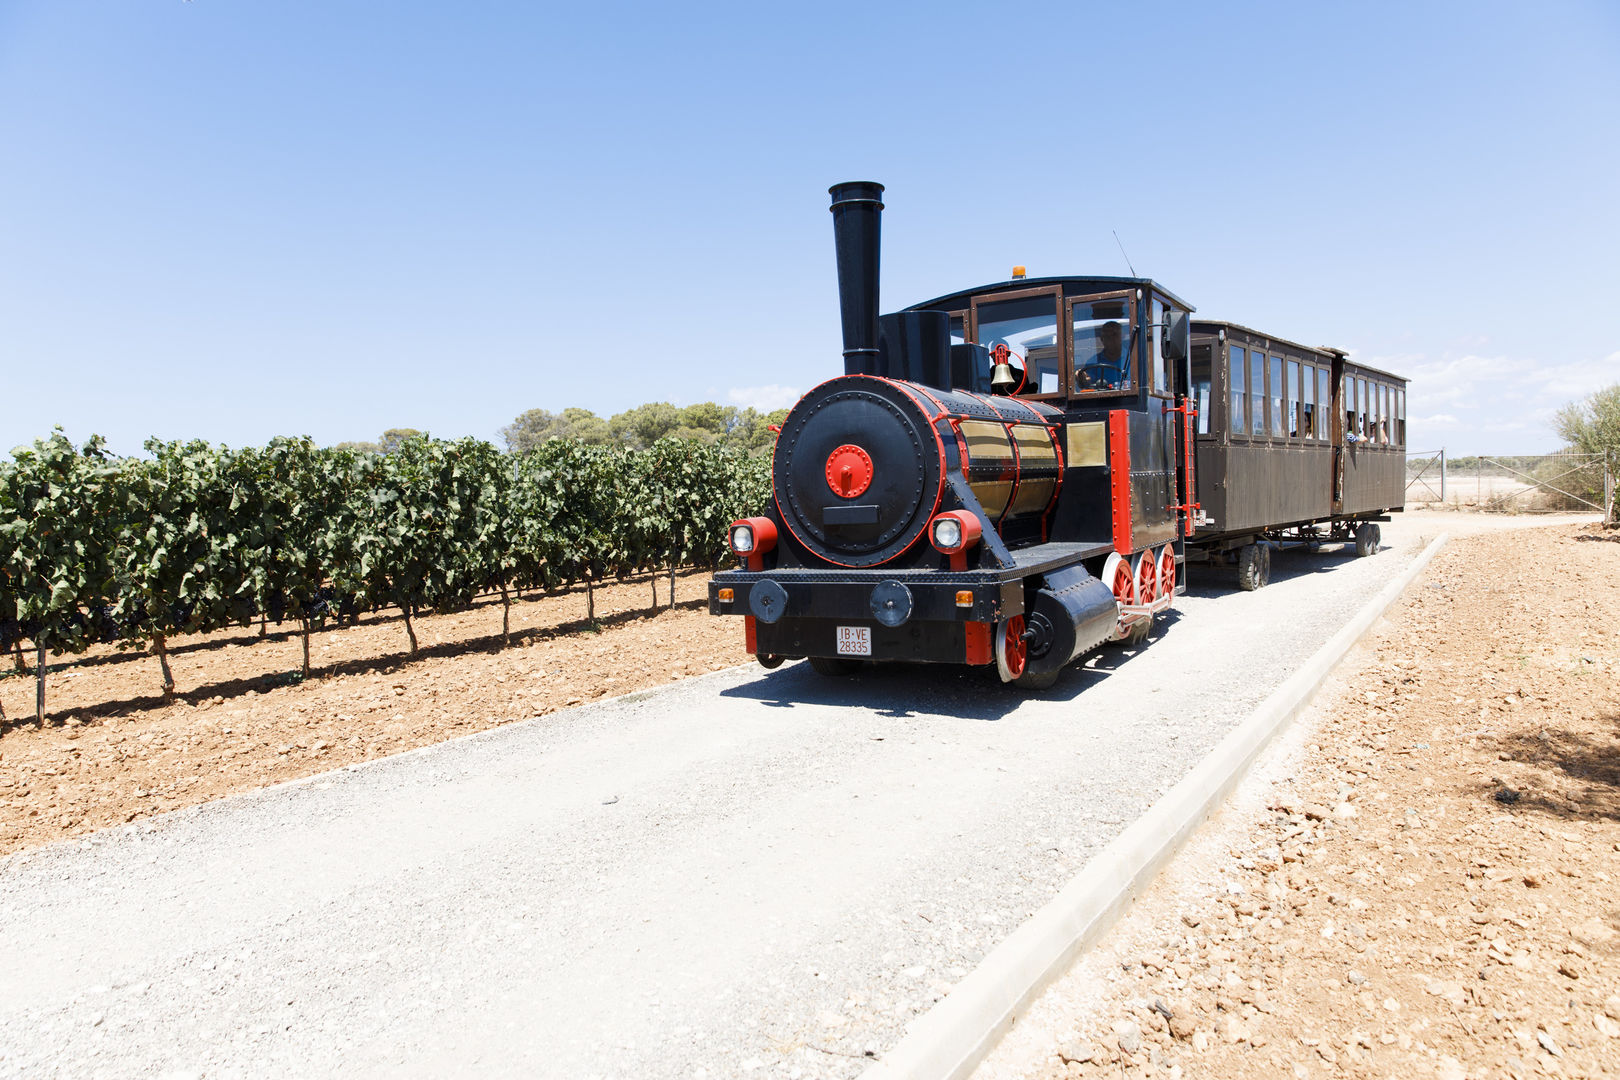 wine tour train in majorca